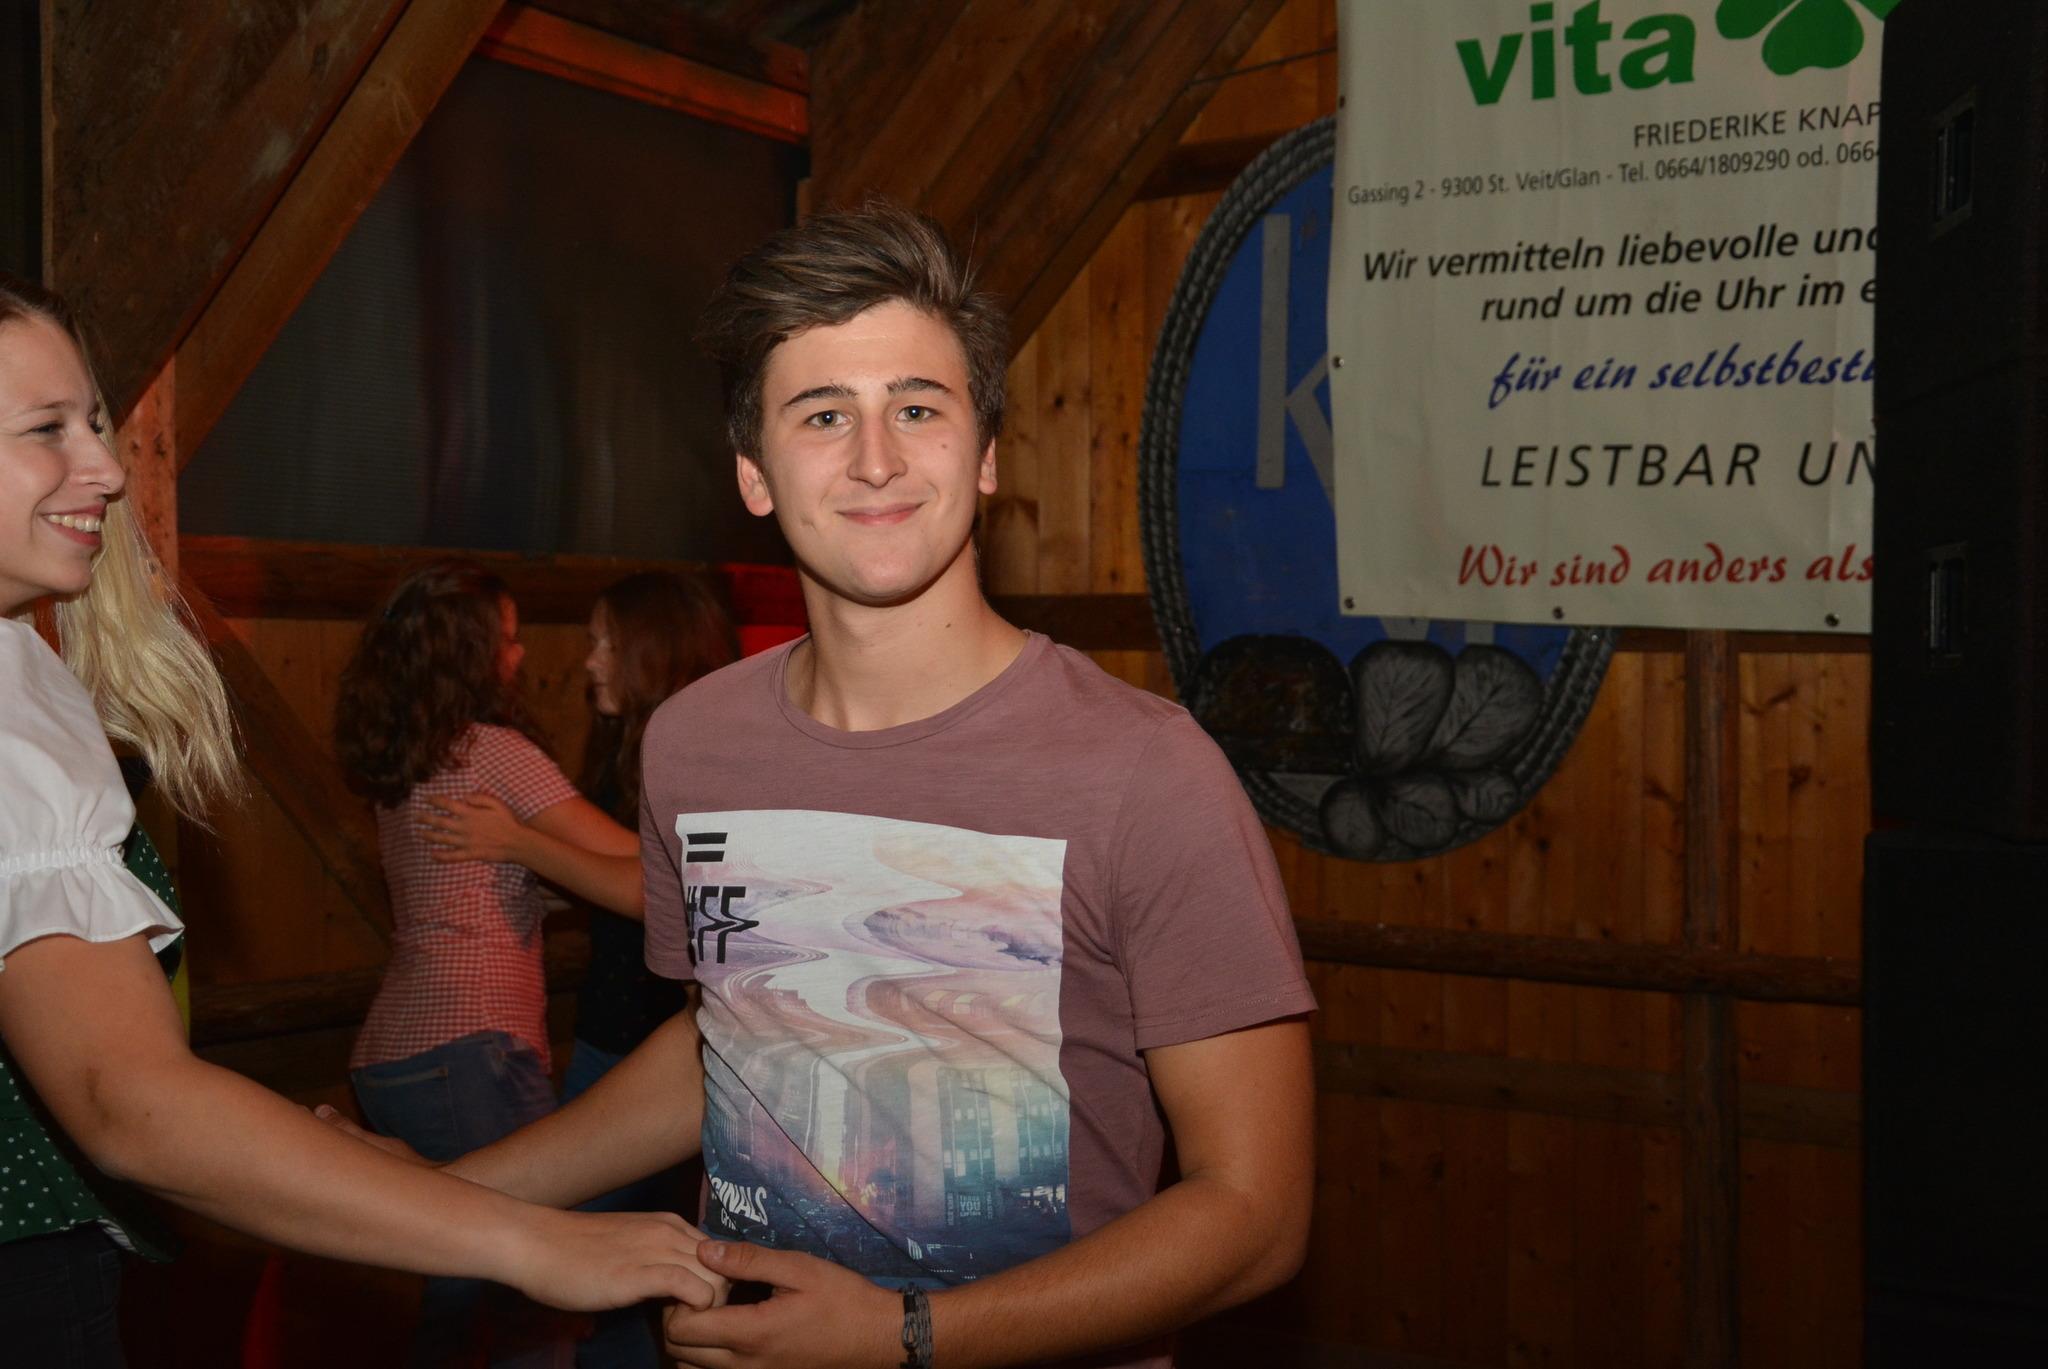 Partnersuche Kanton Sankt Veit An Der Glan, Austria Dating